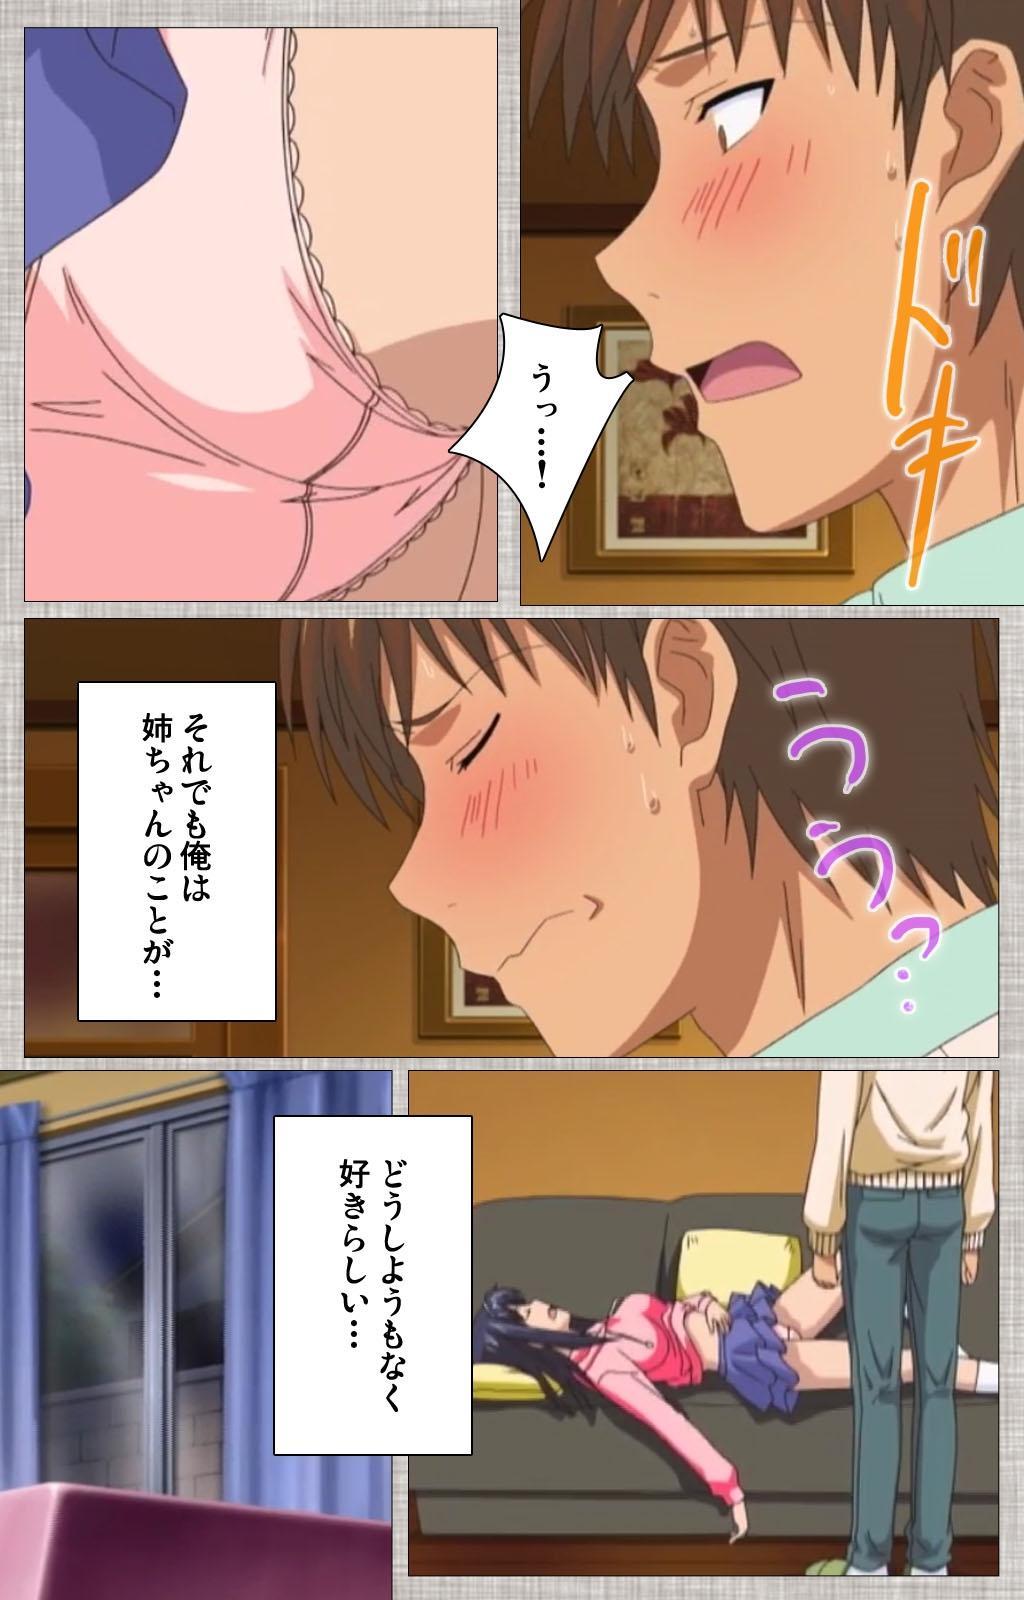 Ane-Koi #1 Complete Ban 10